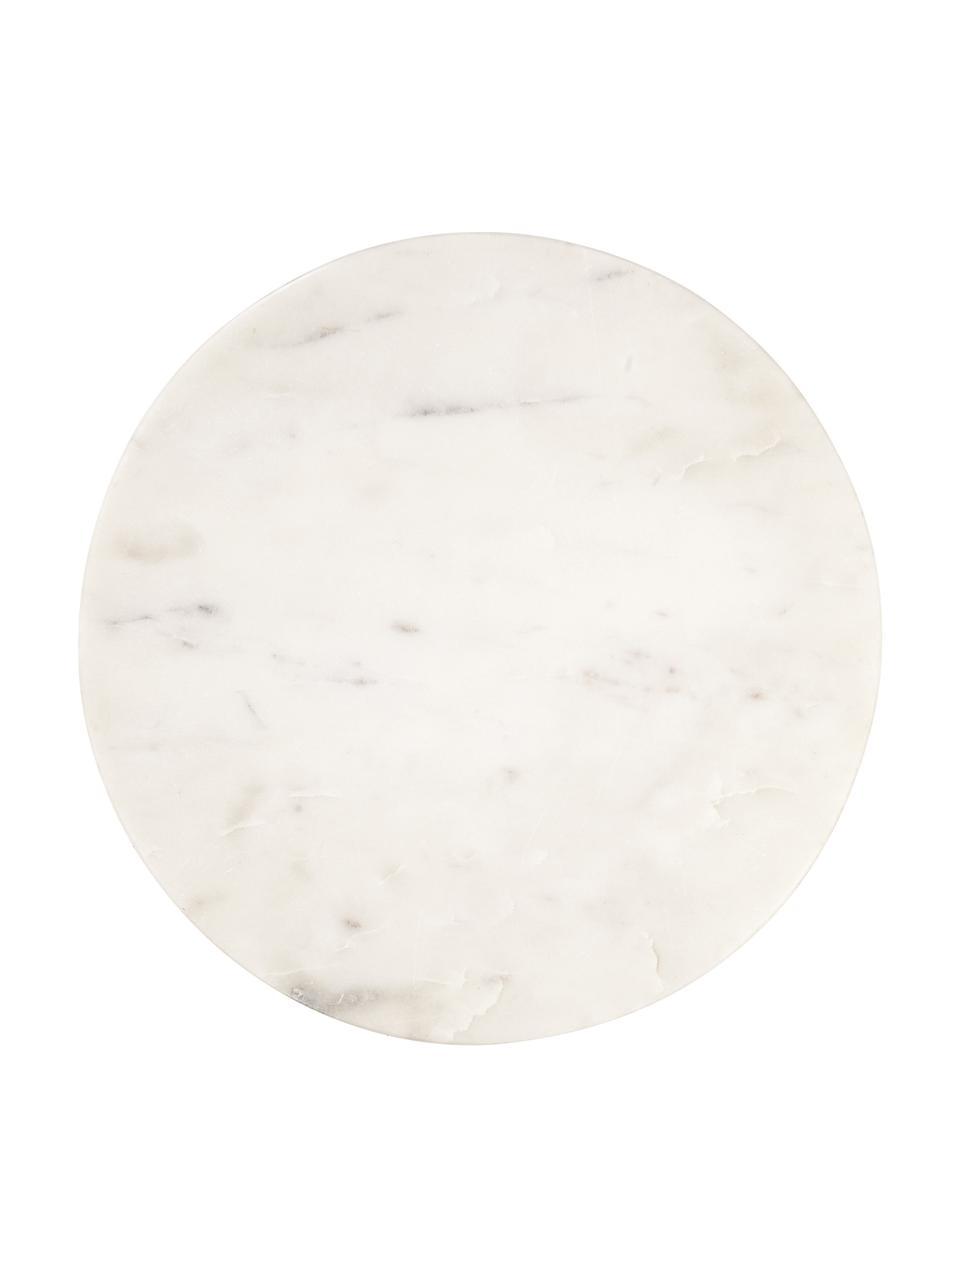 Piatto da portata in marmo Minu, Ø 30 cm, Marmo, Bianco, Ø 30 cm